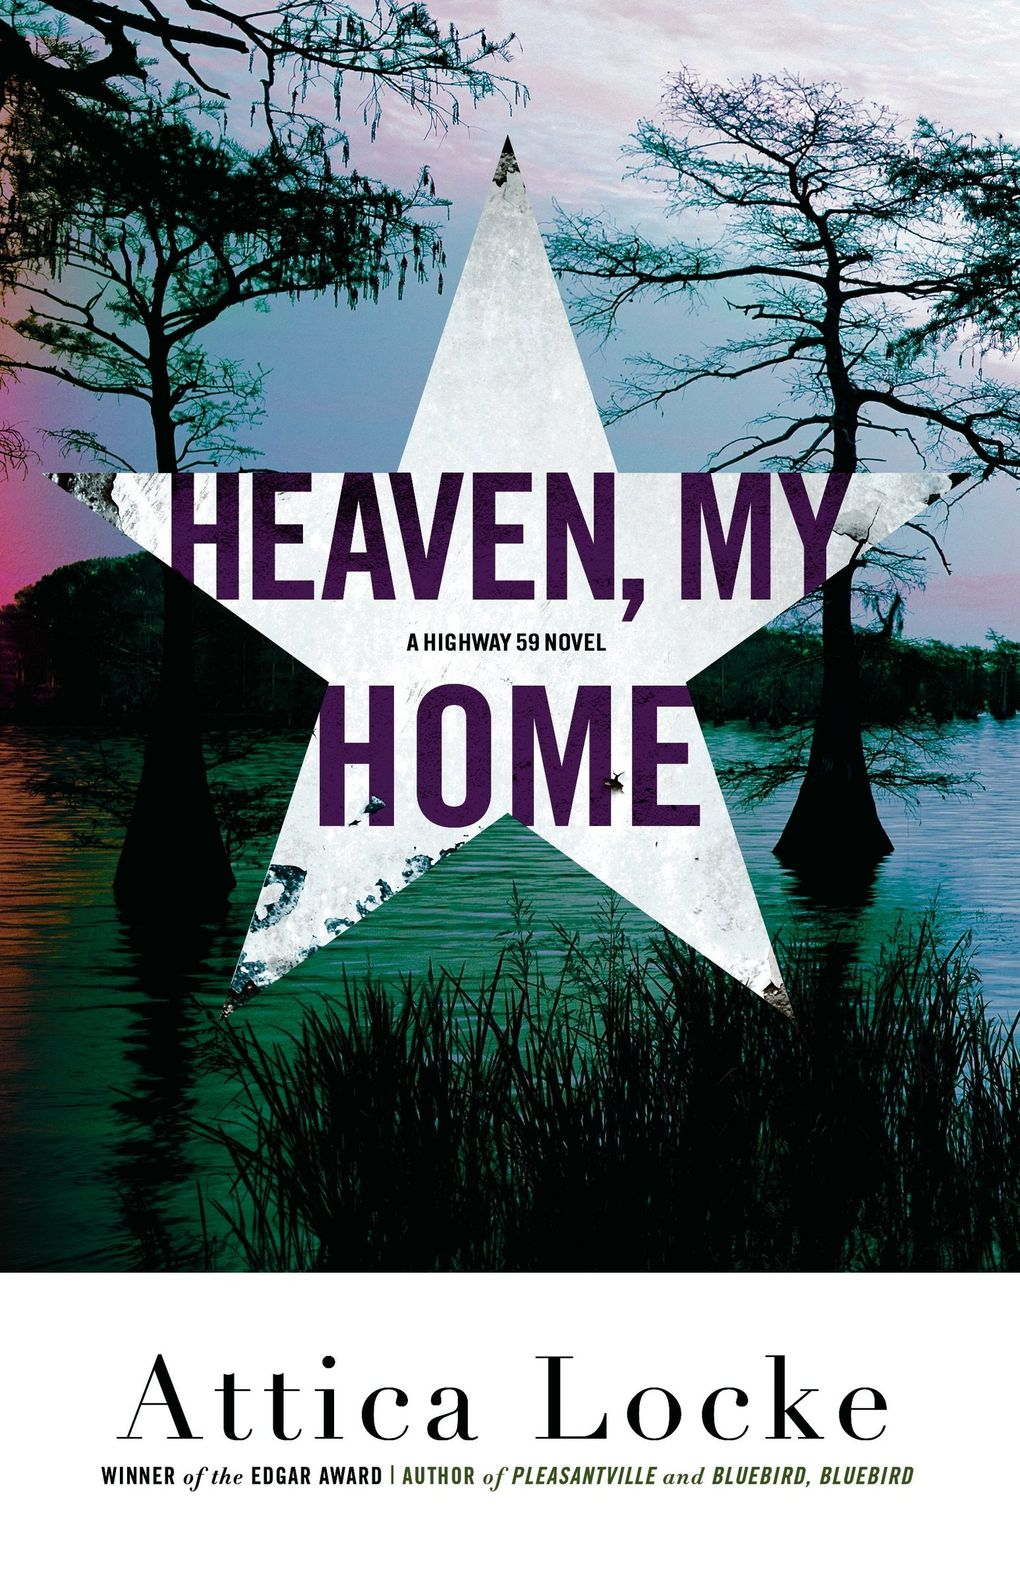 """Heaven, My Home"" by Attica Locke (Mulholland Books)"